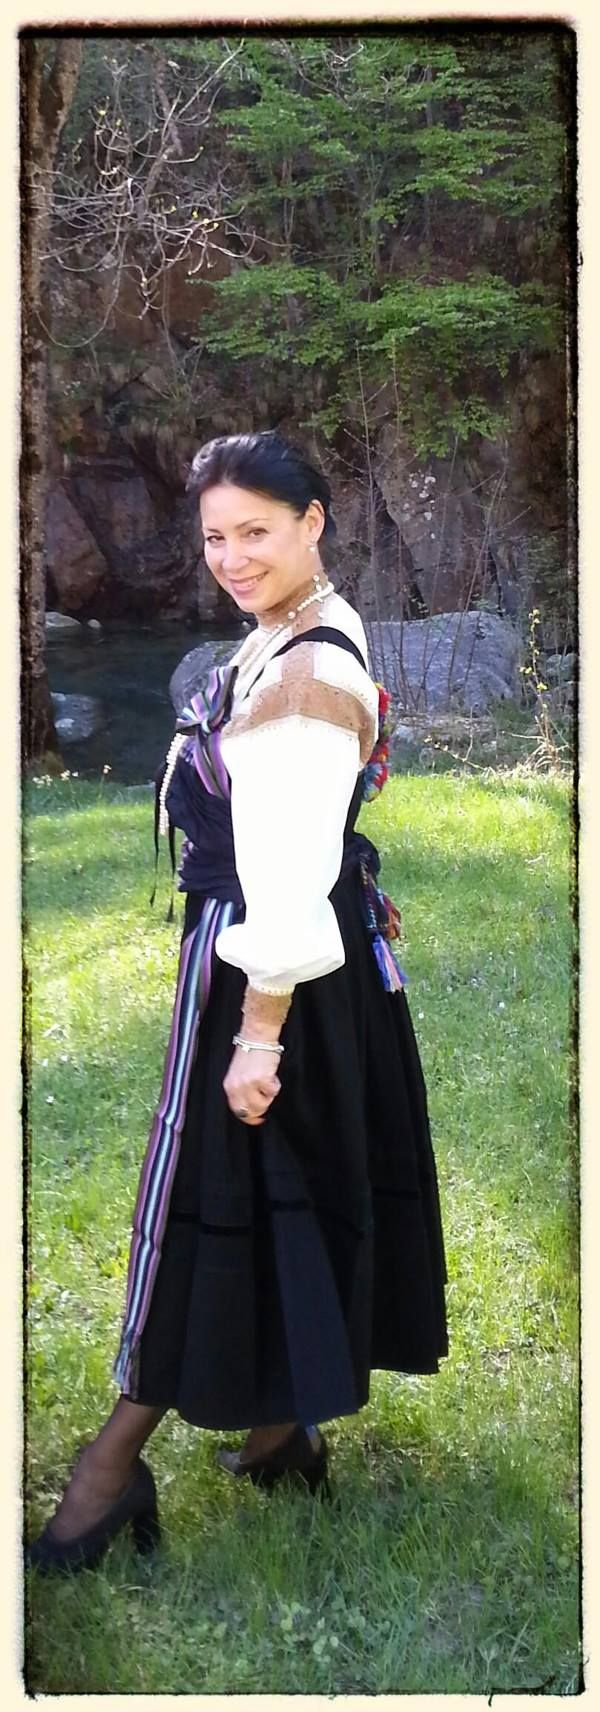 Ancient wedding's dress - Fobello in Valsesia (VC) - Piemont (Italy)